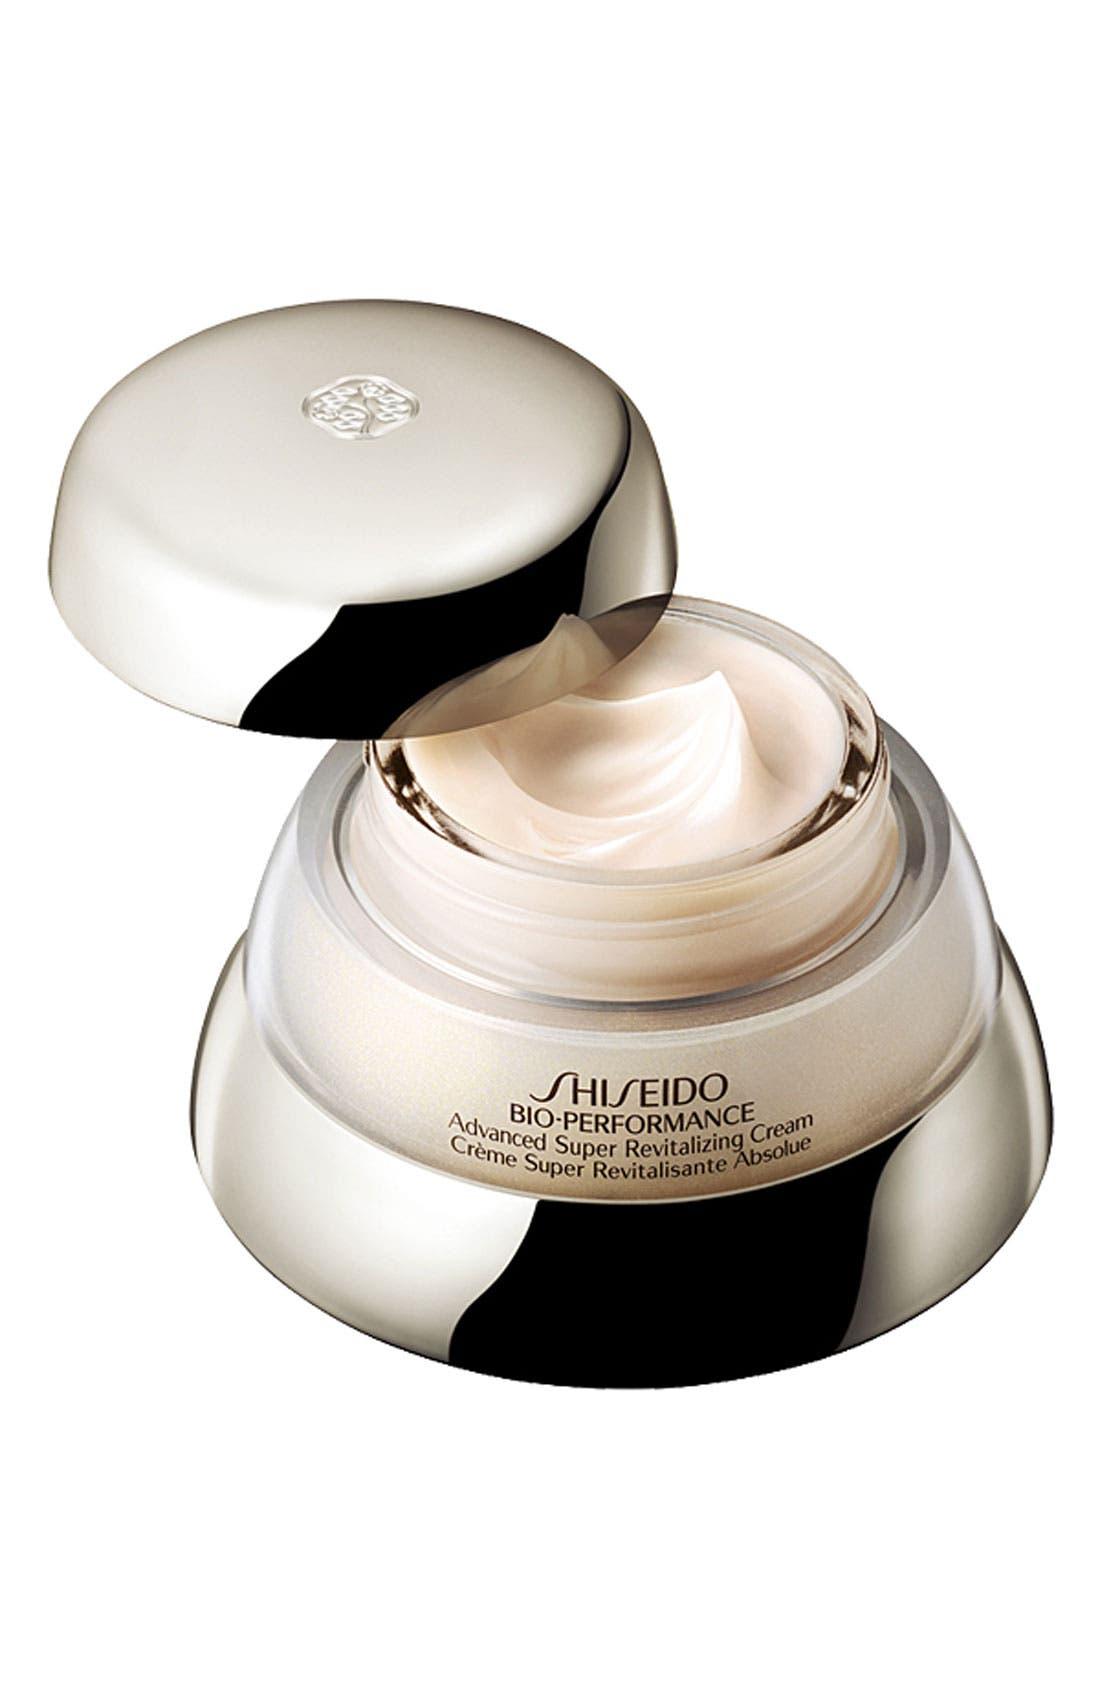 Bio-Performance Advance Super Revitalizing Cream,                             Main thumbnail 1, color,                             NO COLOR